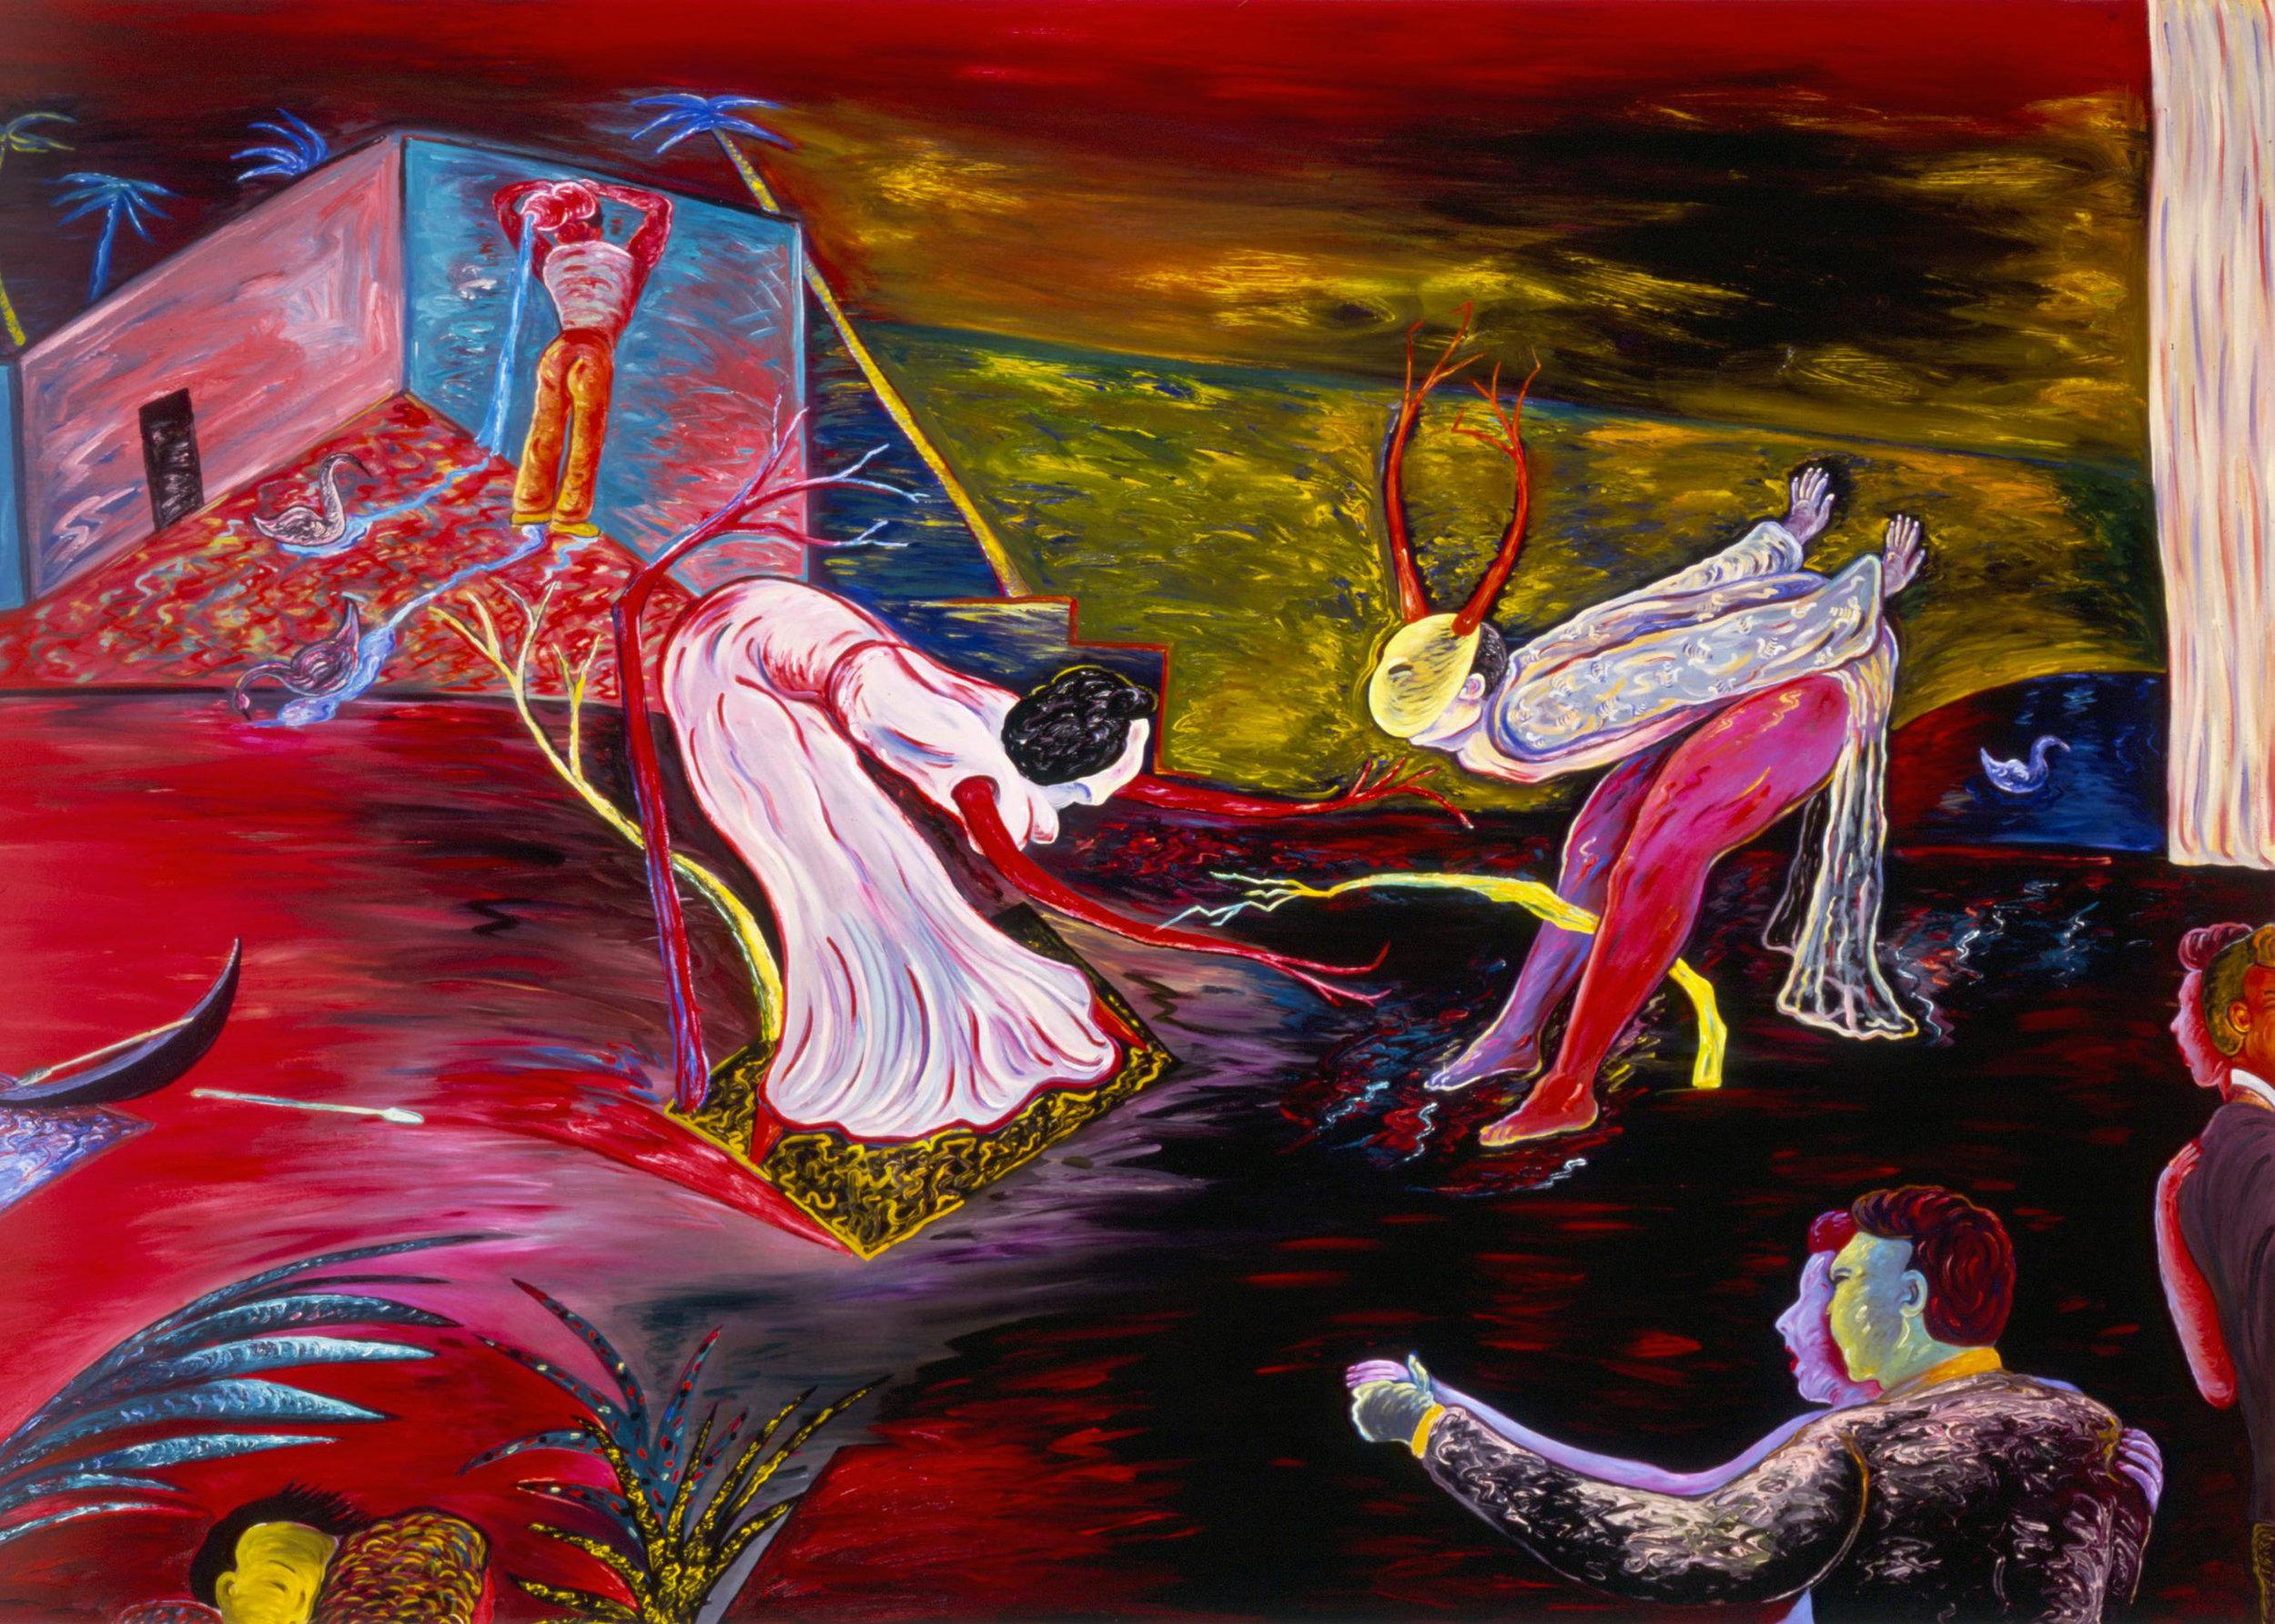 "The Dance, 72"" × 96"", oil on canvas, 1986"